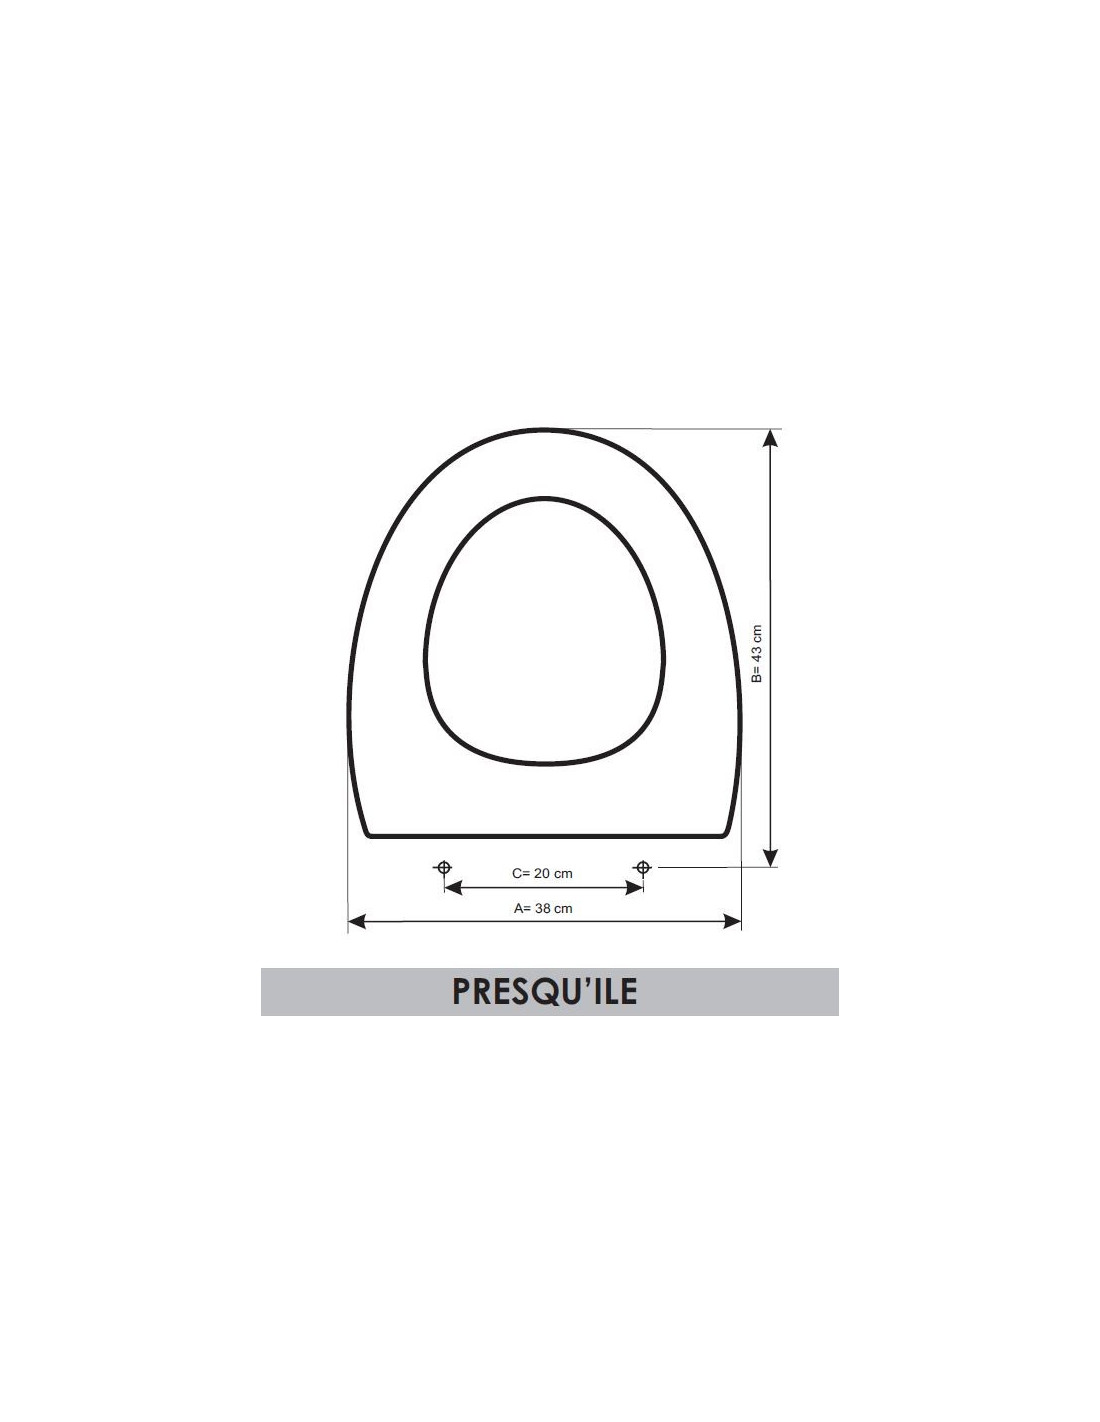 abattant du wc jacob delafon presquile adaptable in. Black Bedroom Furniture Sets. Home Design Ideas